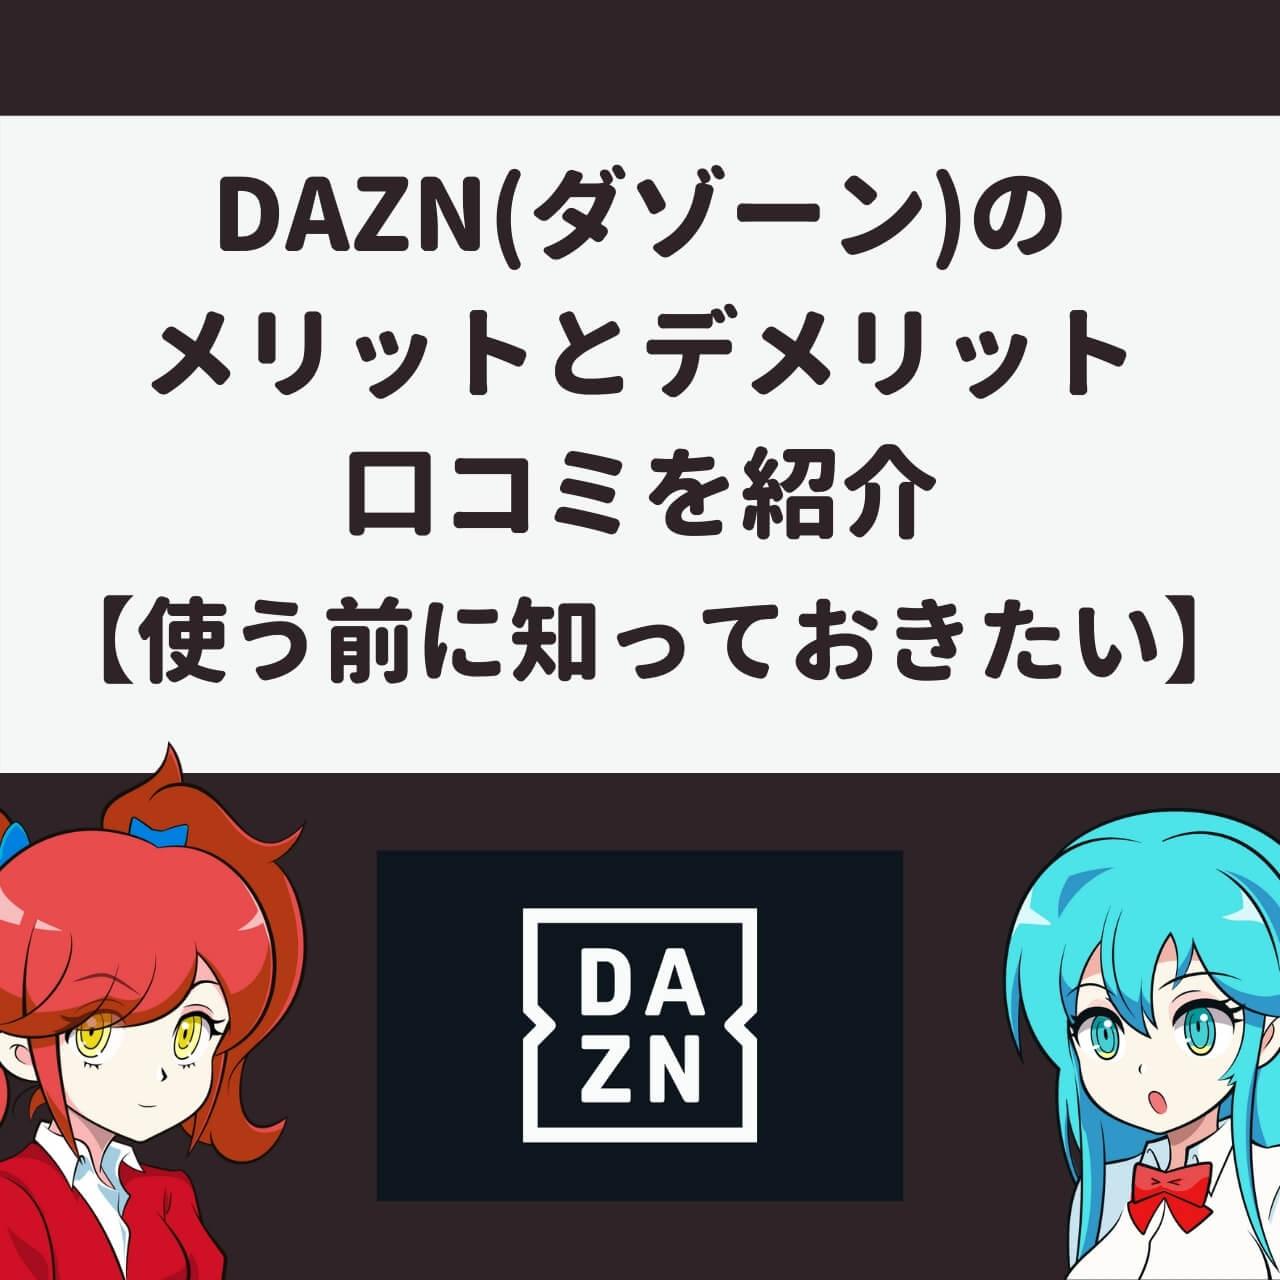 DAZN(ダゾーン)のメリットとデメリット、口コミを紹介【使う前に知っておきたい】